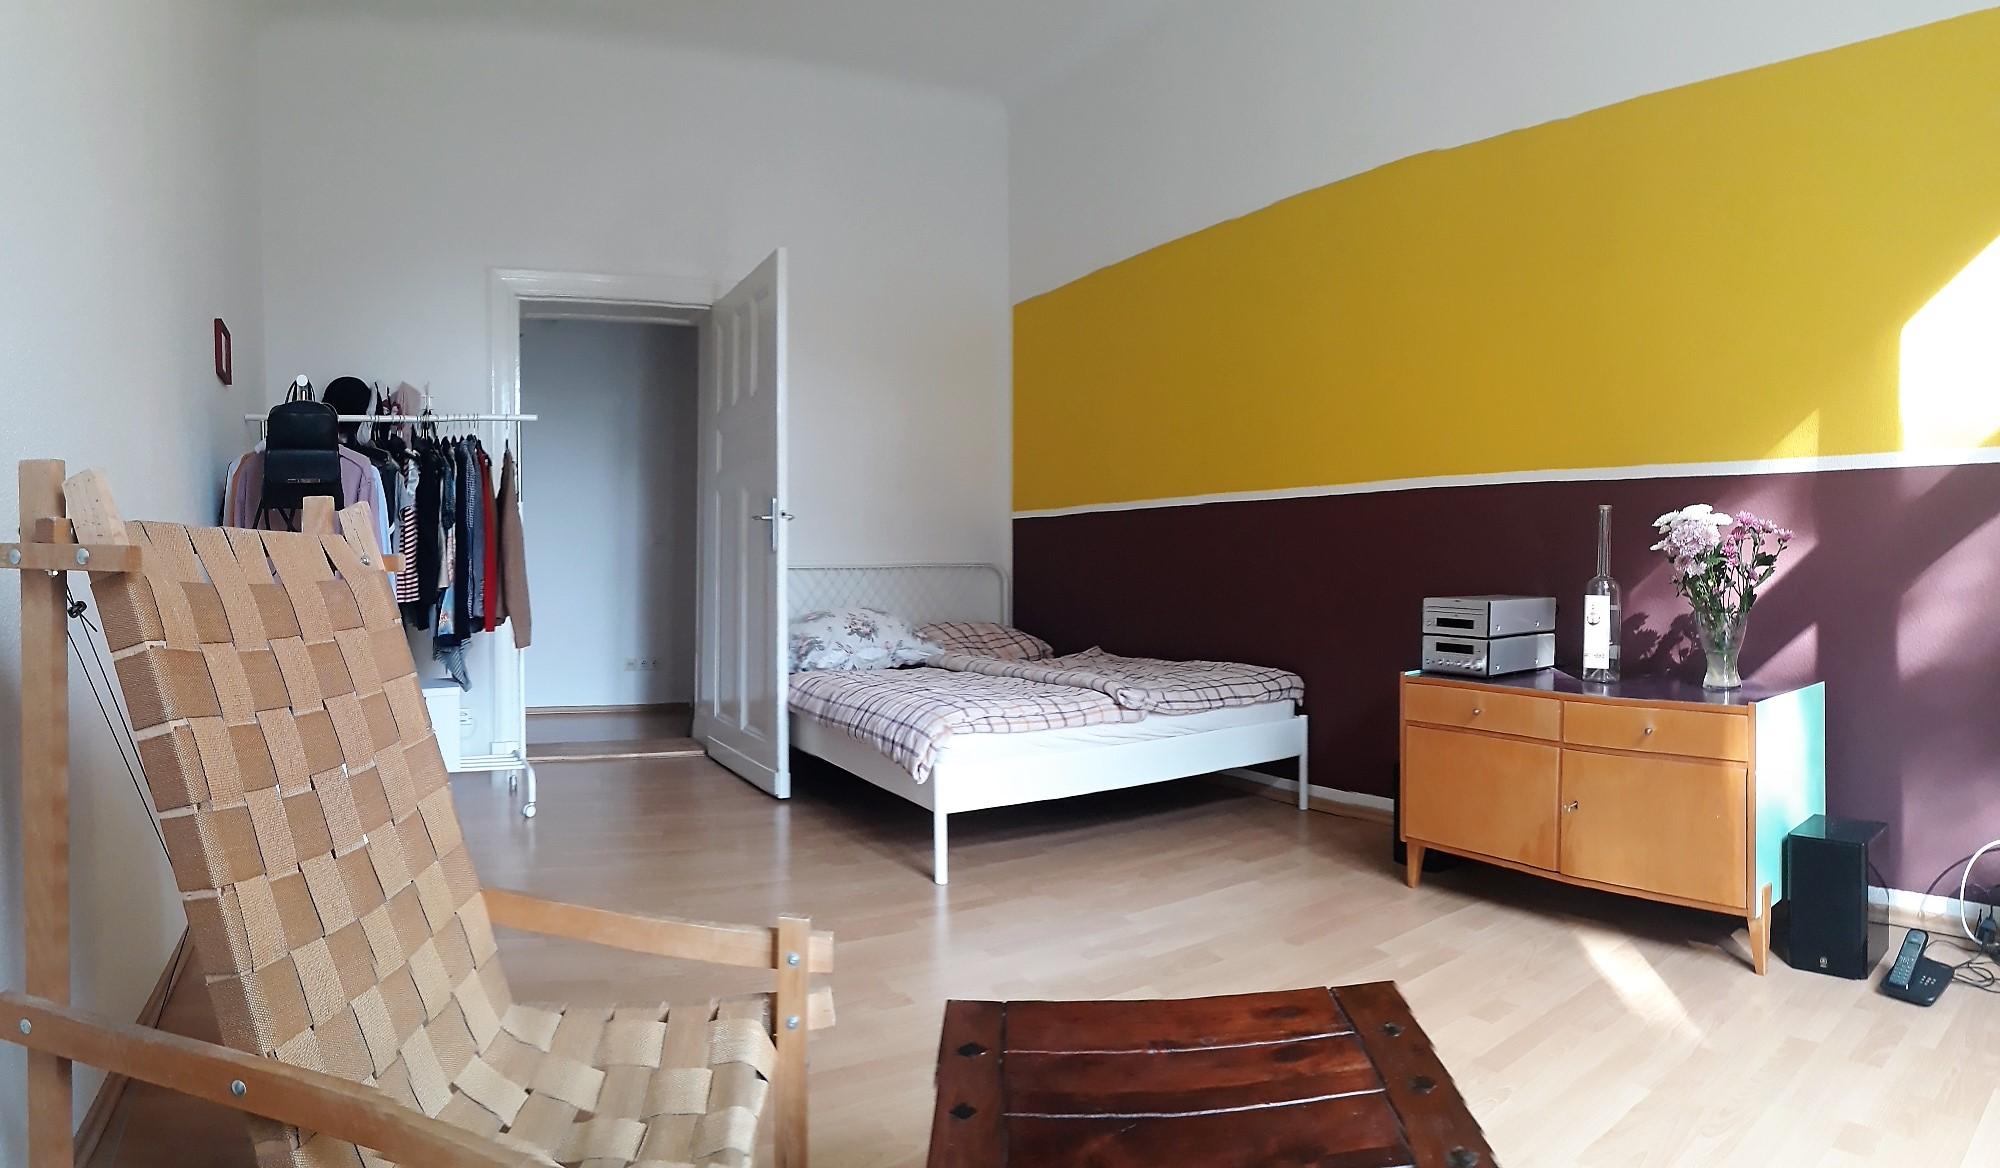 coliving coworking near pren berlin startup offices. Black Bedroom Furniture Sets. Home Design Ideas